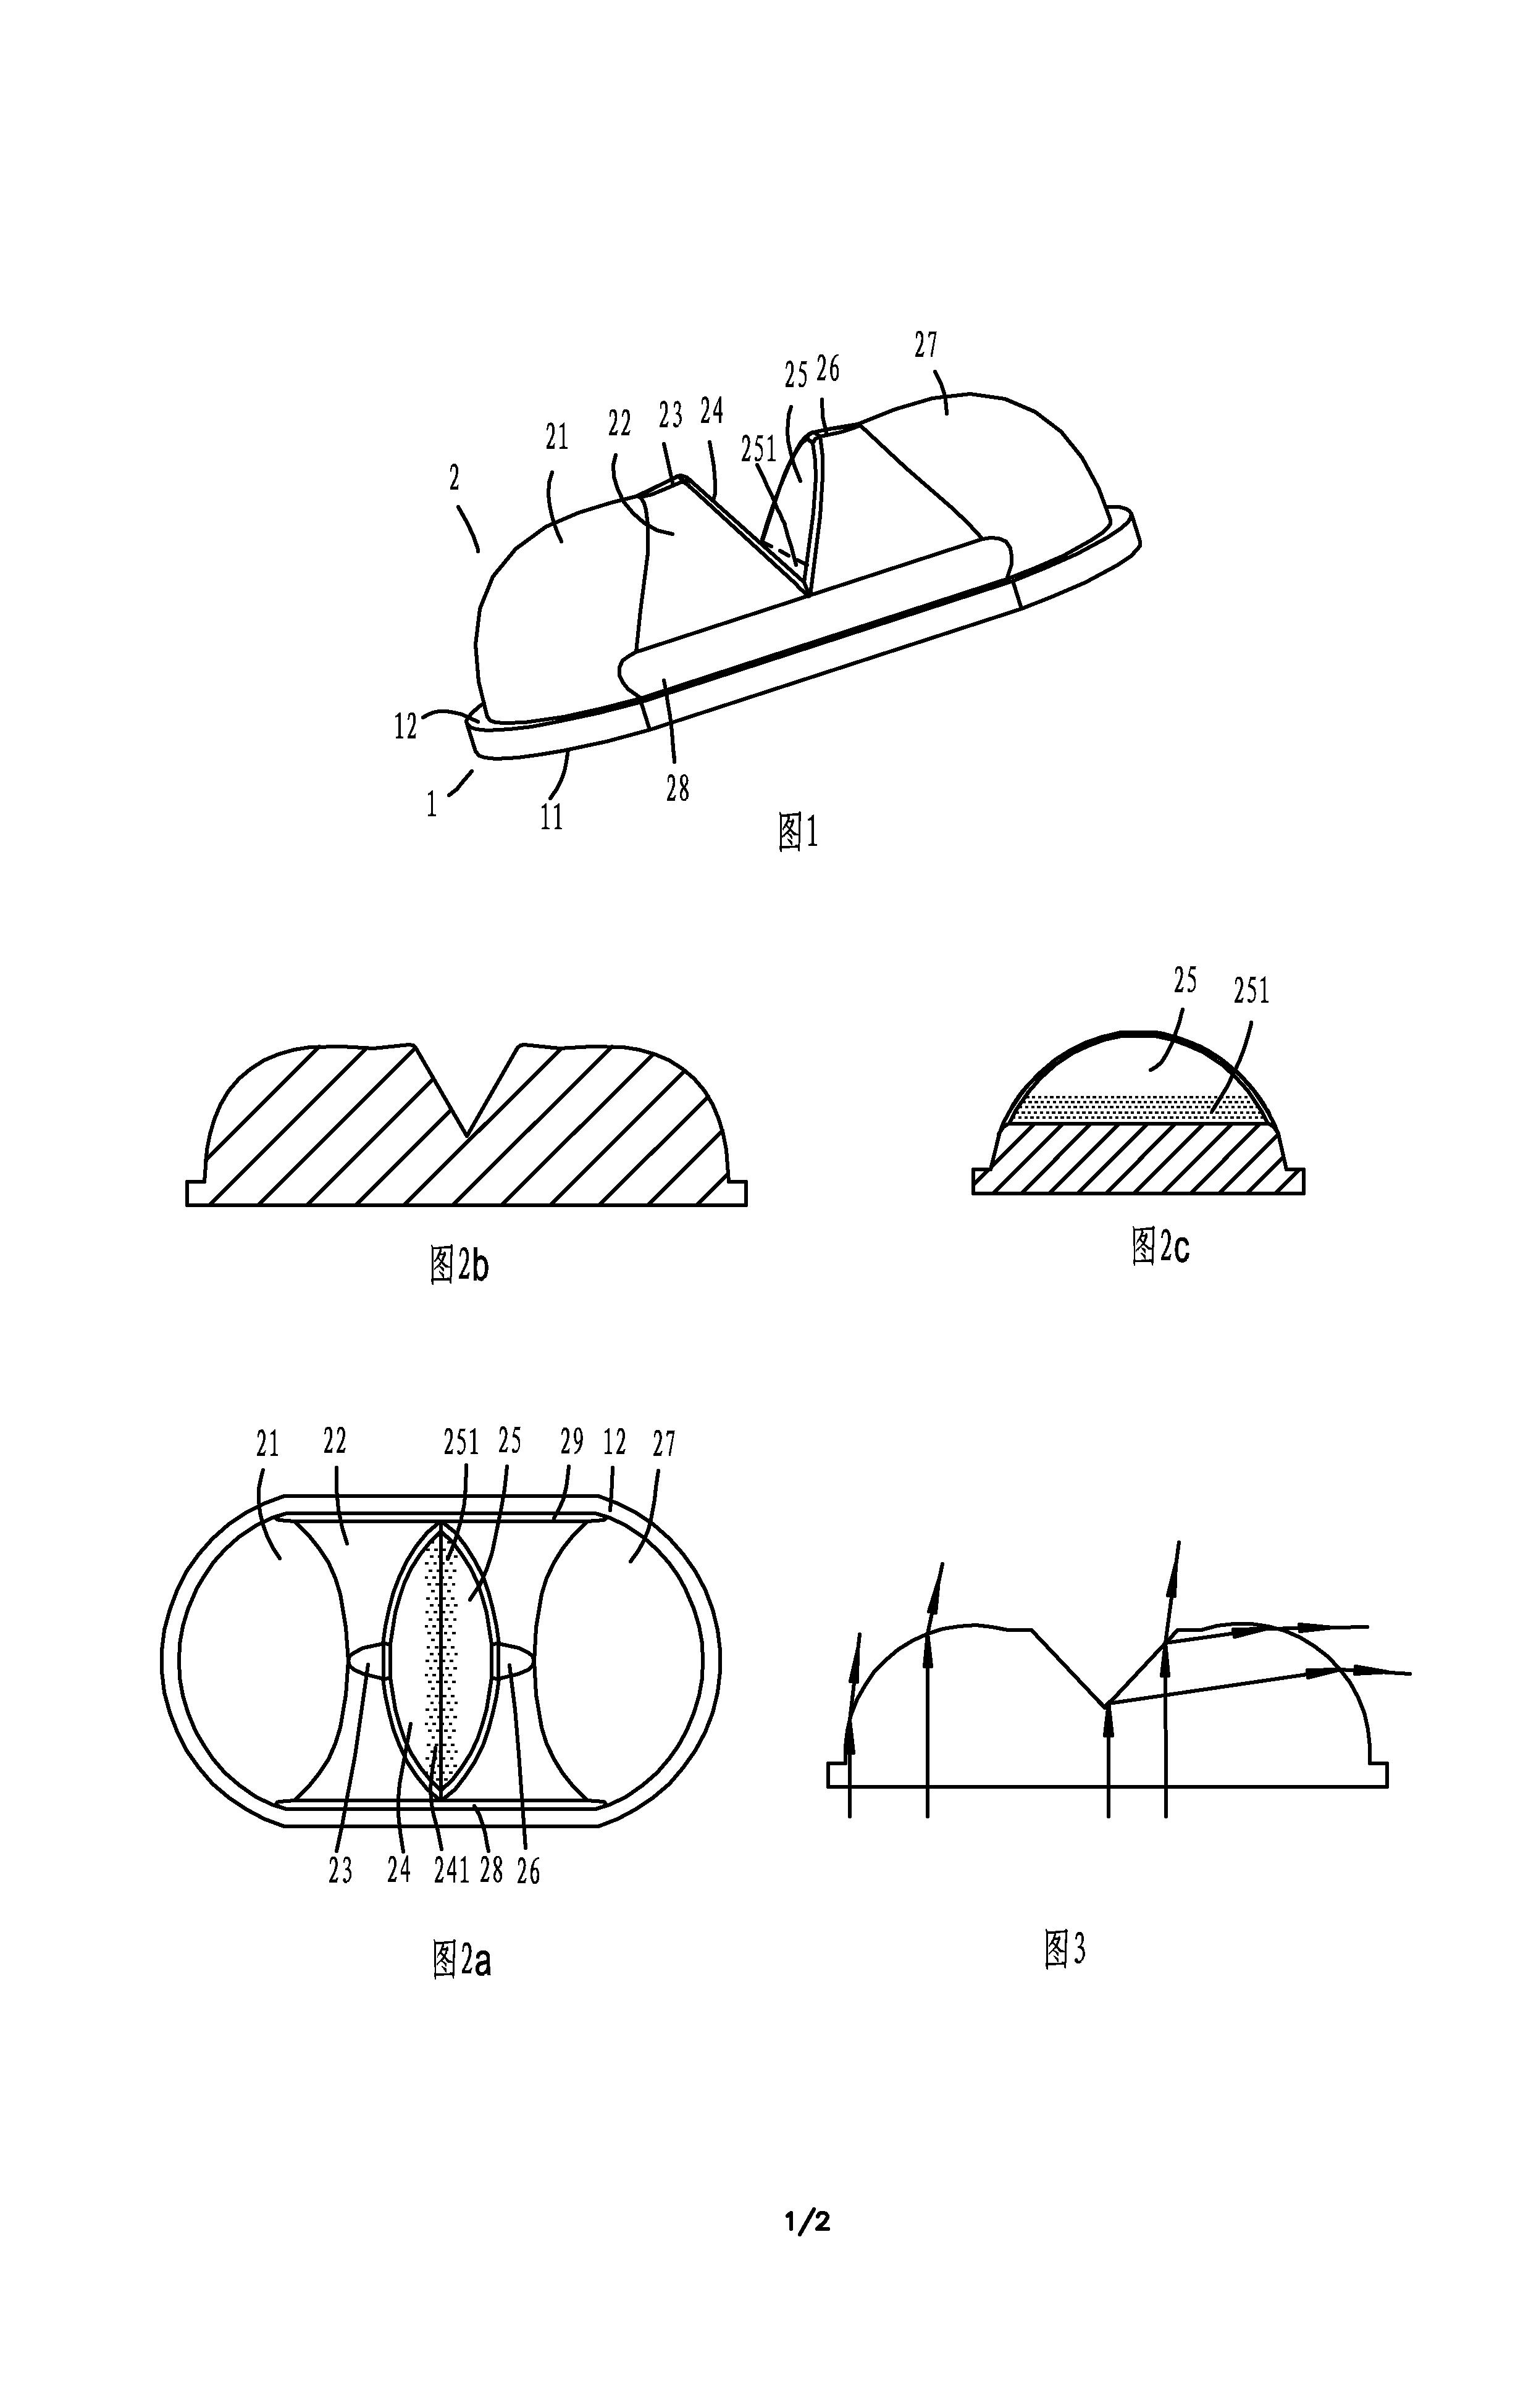 patent wo2011015113a1